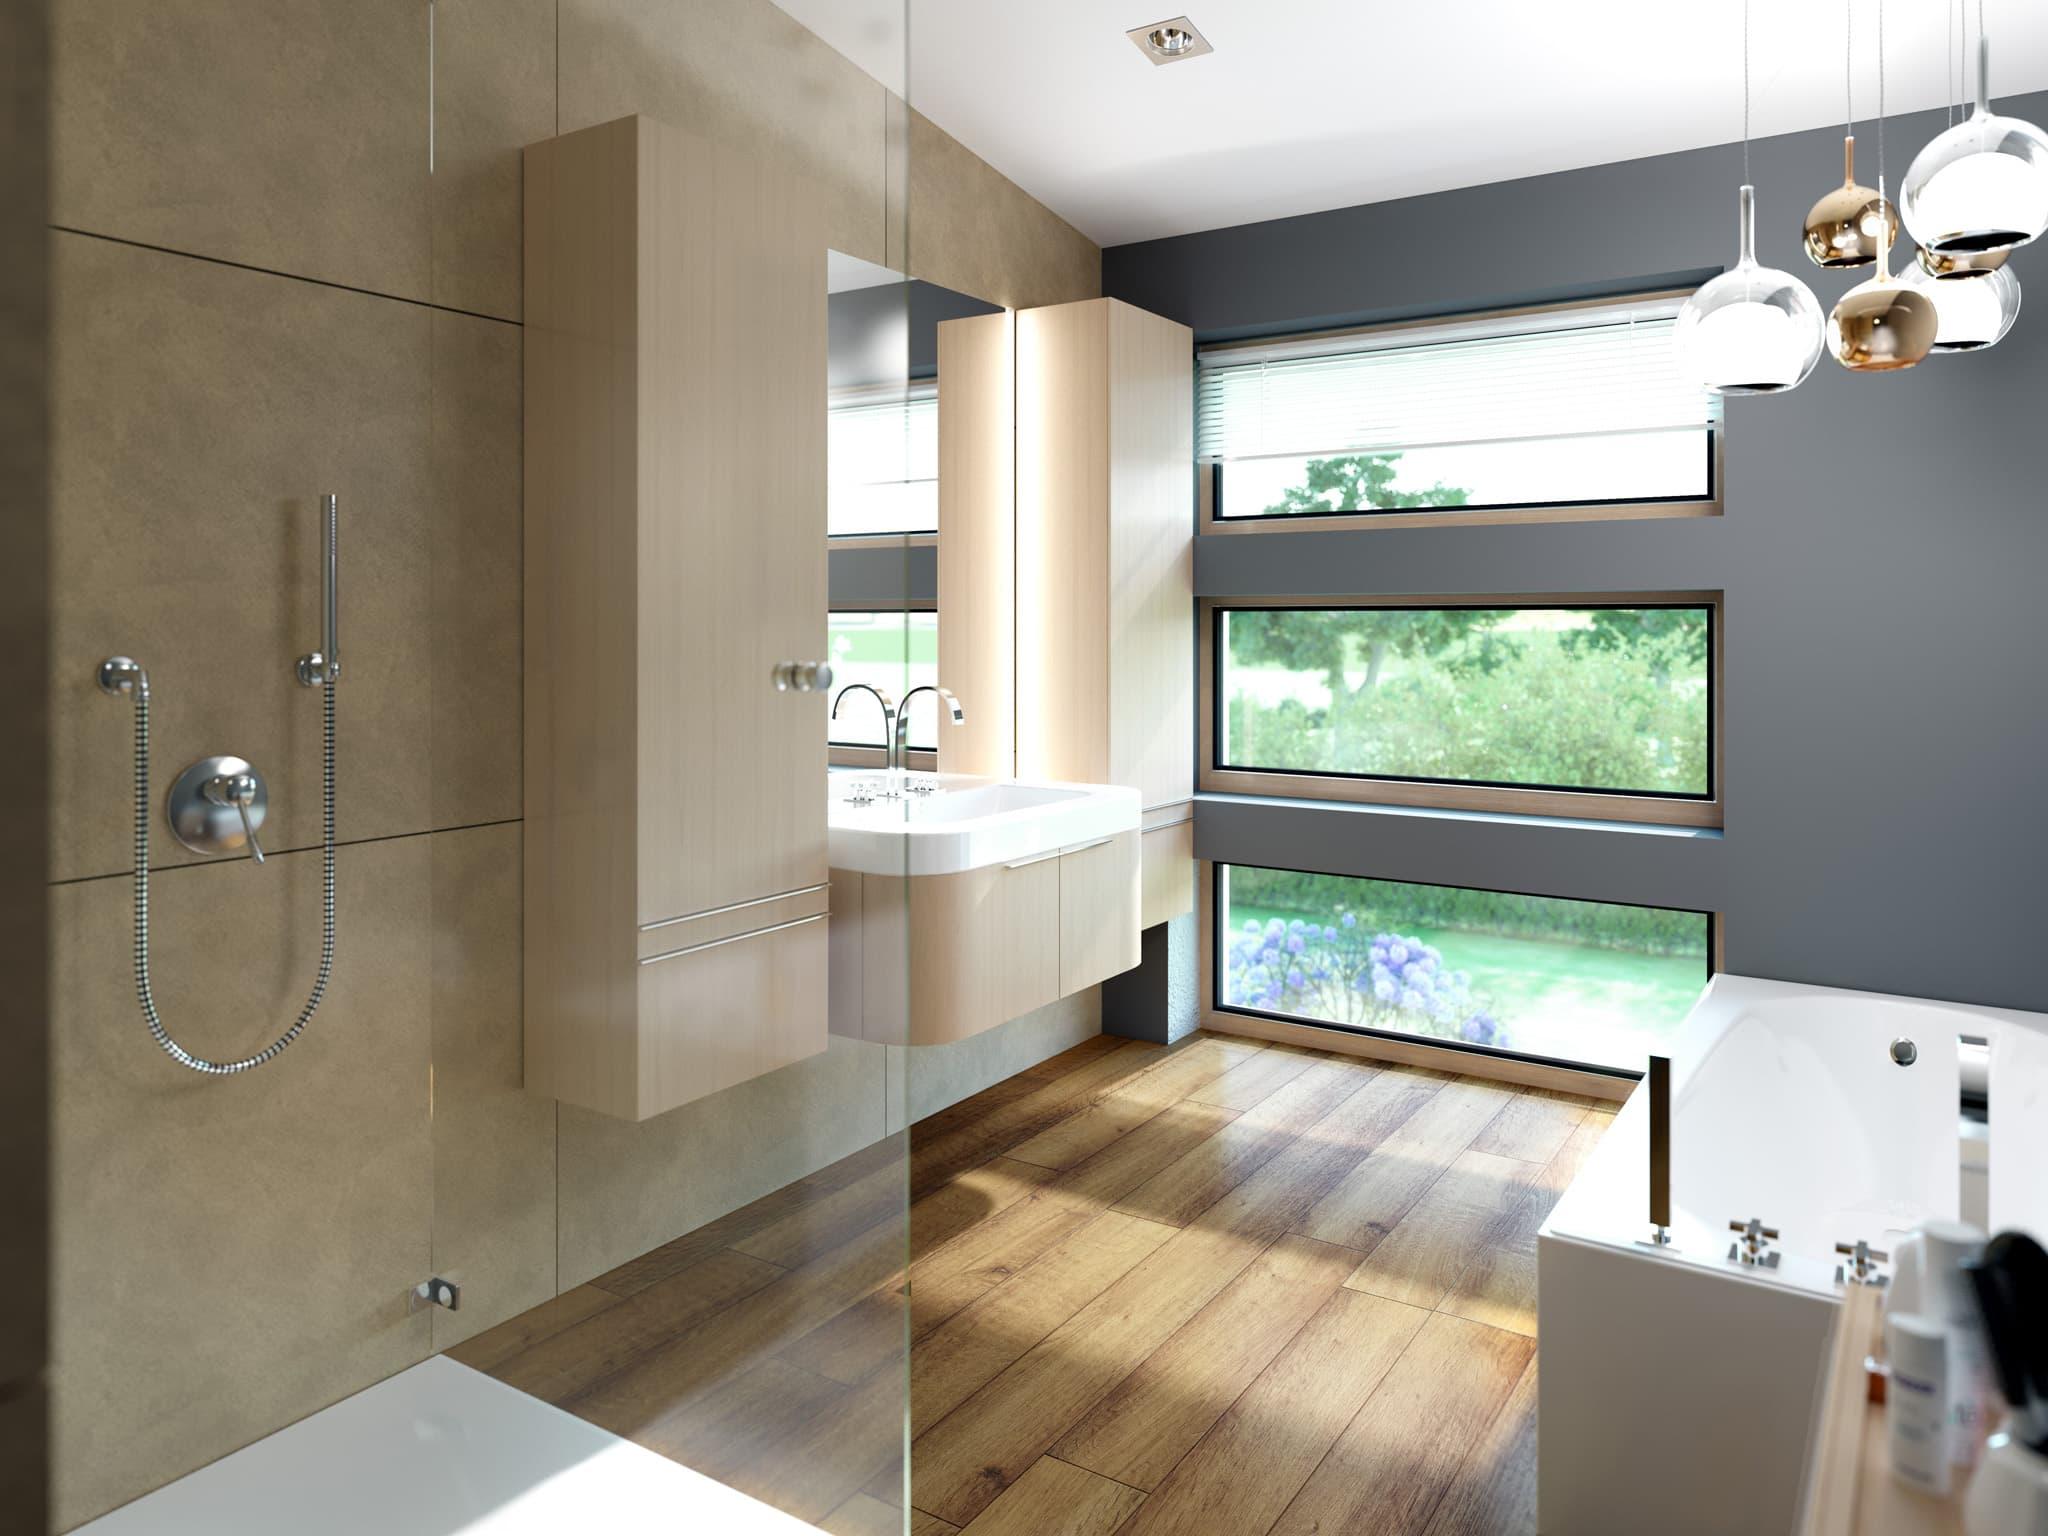 Badezimmer Ideen - Inneneinrichtung Fertighaus SOLUTION 204 V4 von Living Haus - HausbauDirekt.de